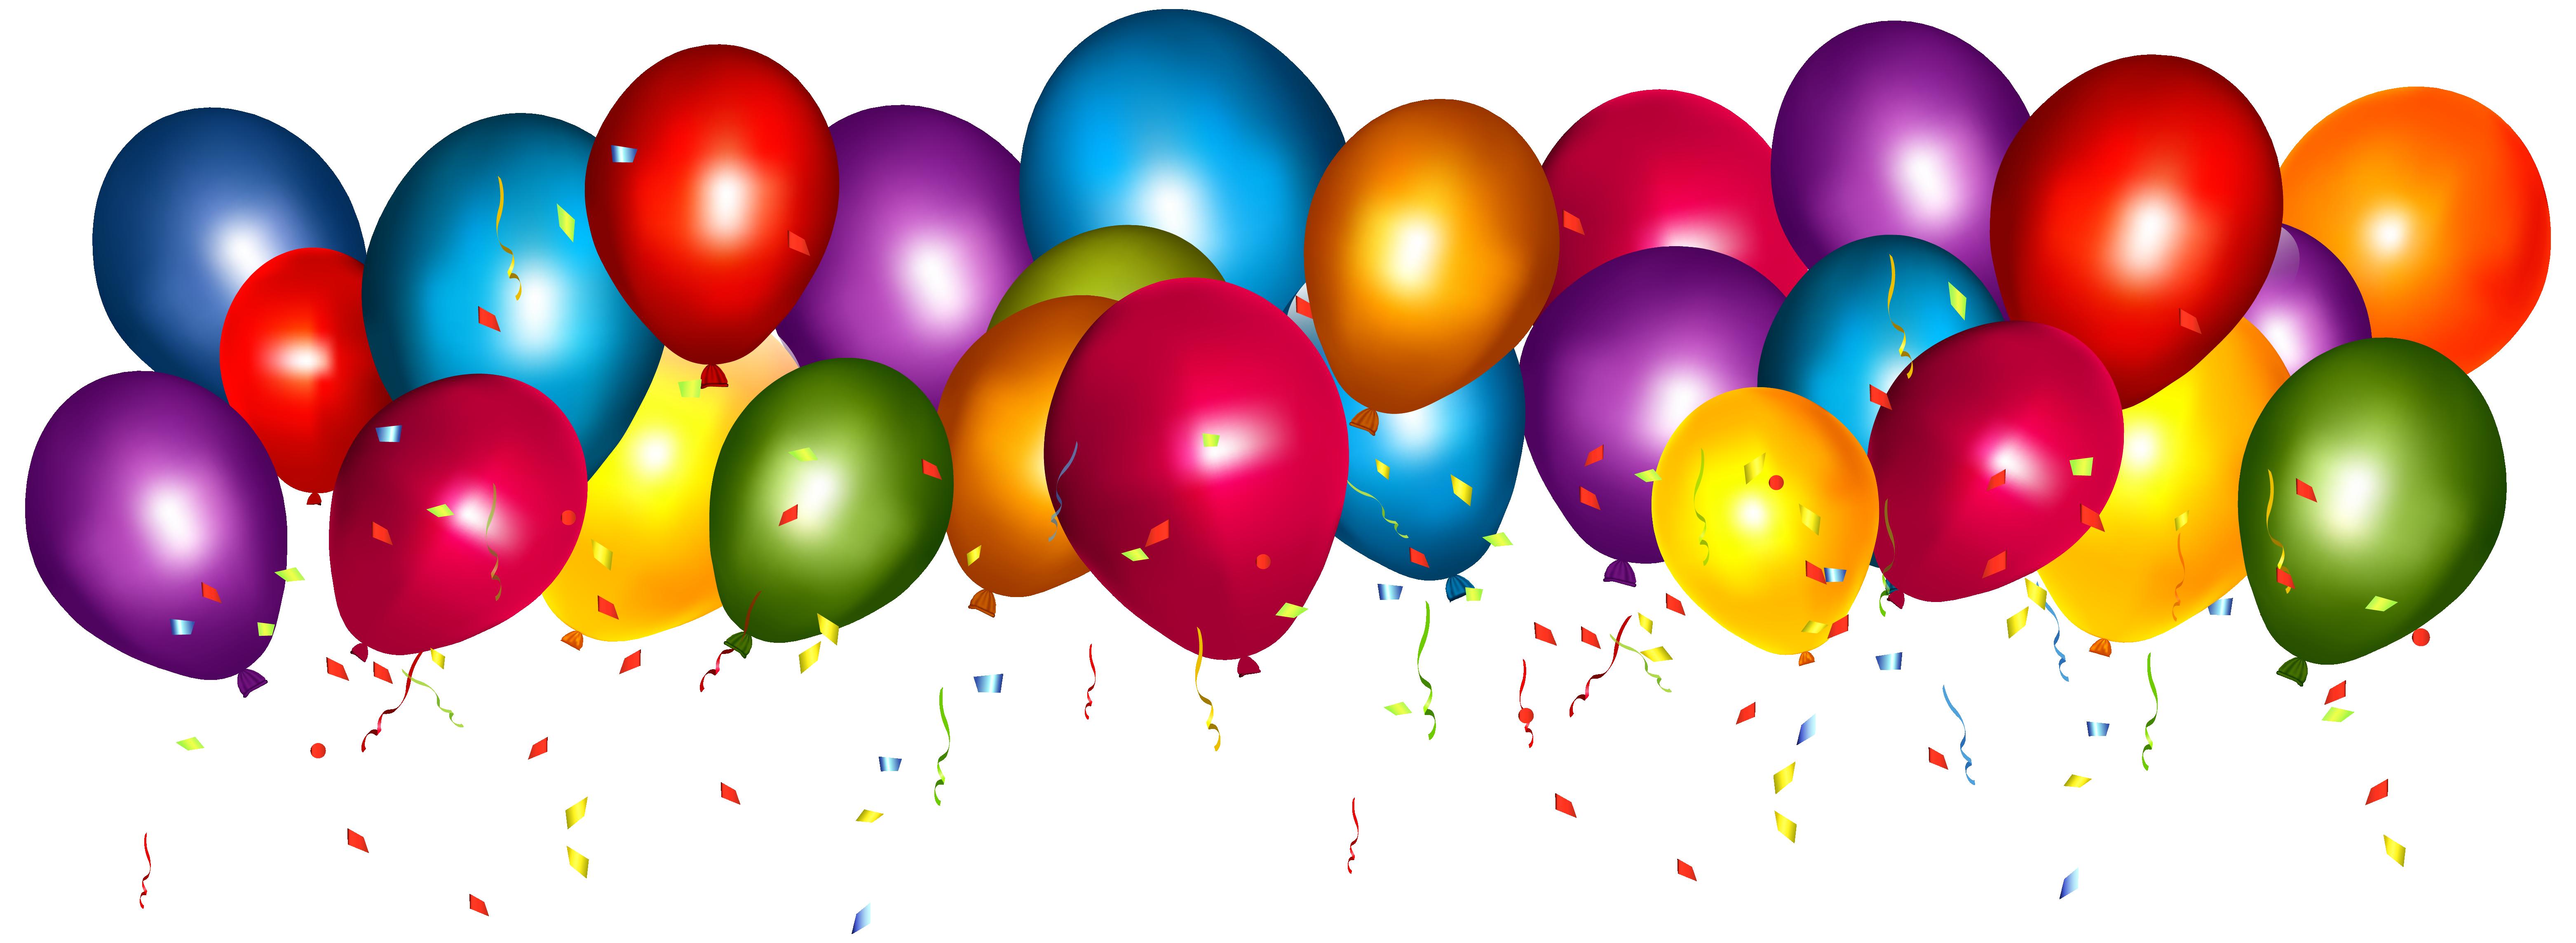 Confetti clipart balloon confetti. Transparent colorful balloons with